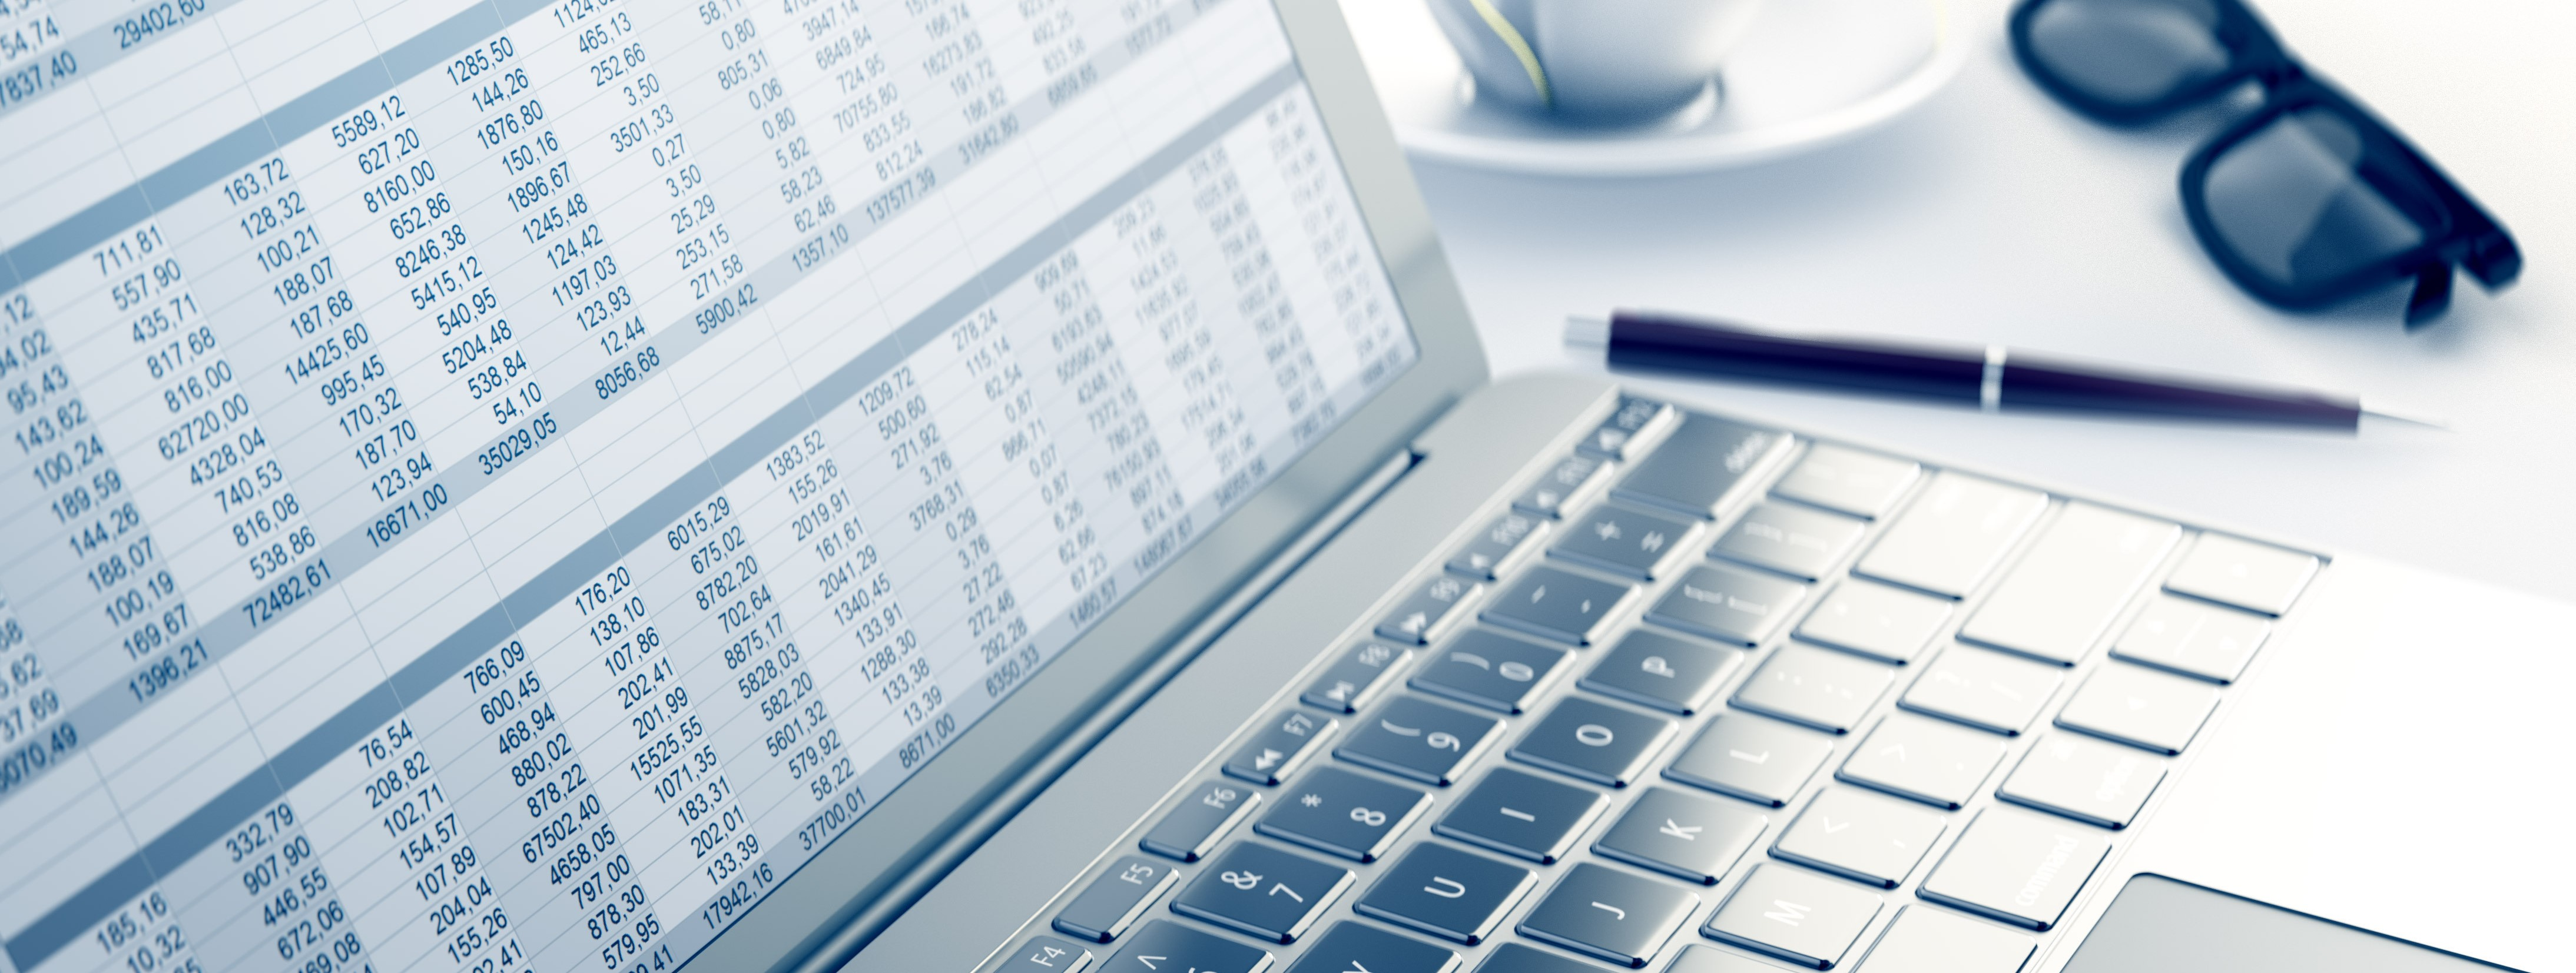 Customer Relationship Management System vs. Spreadsheets